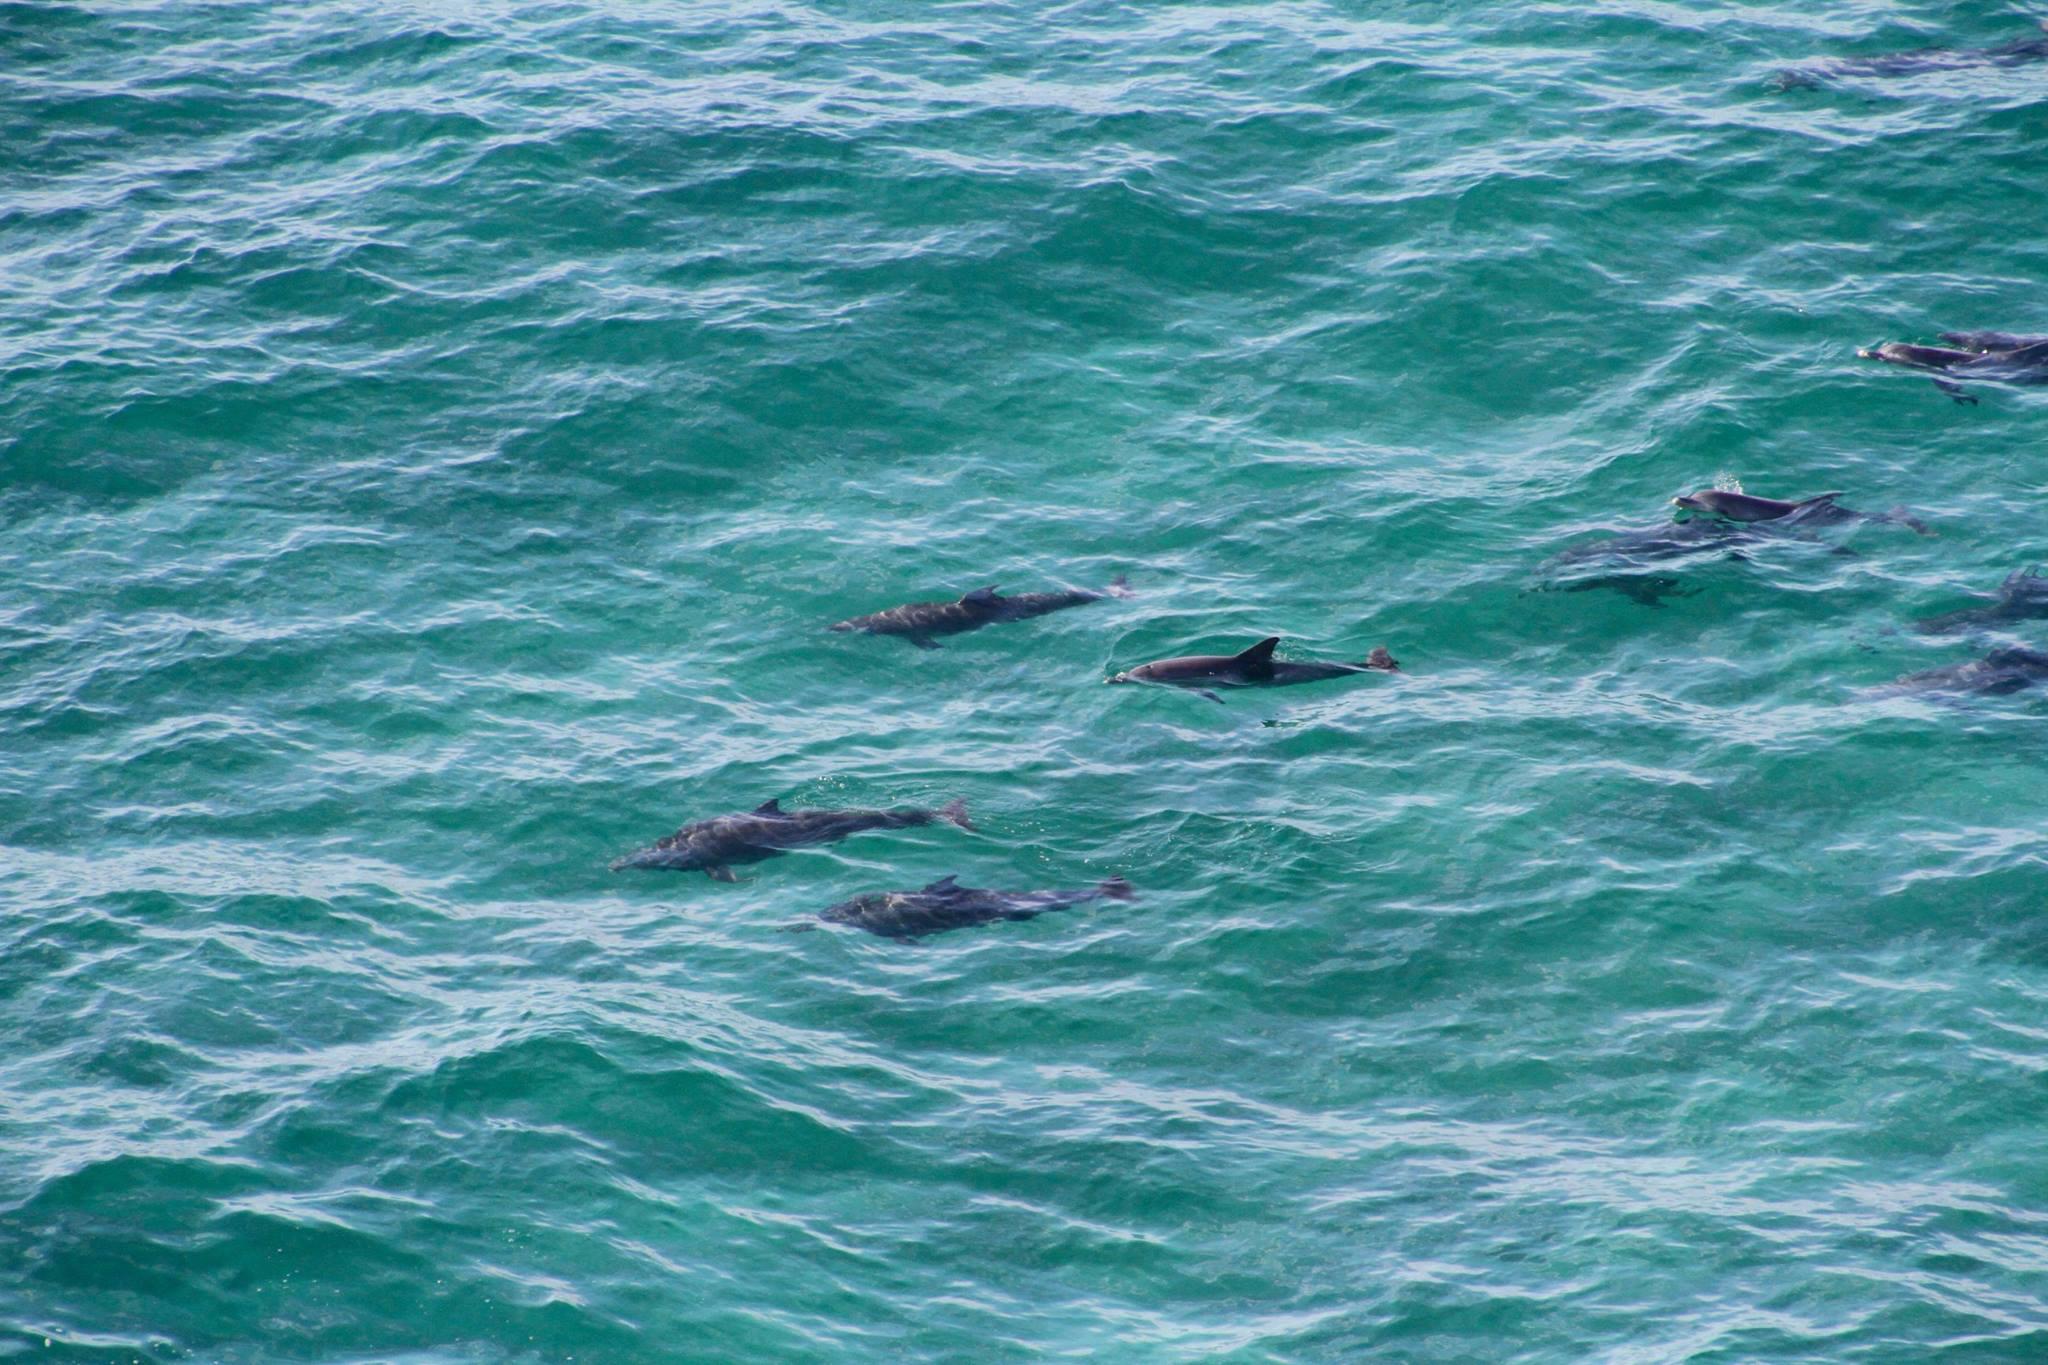 byron bay lifestyle dolphins